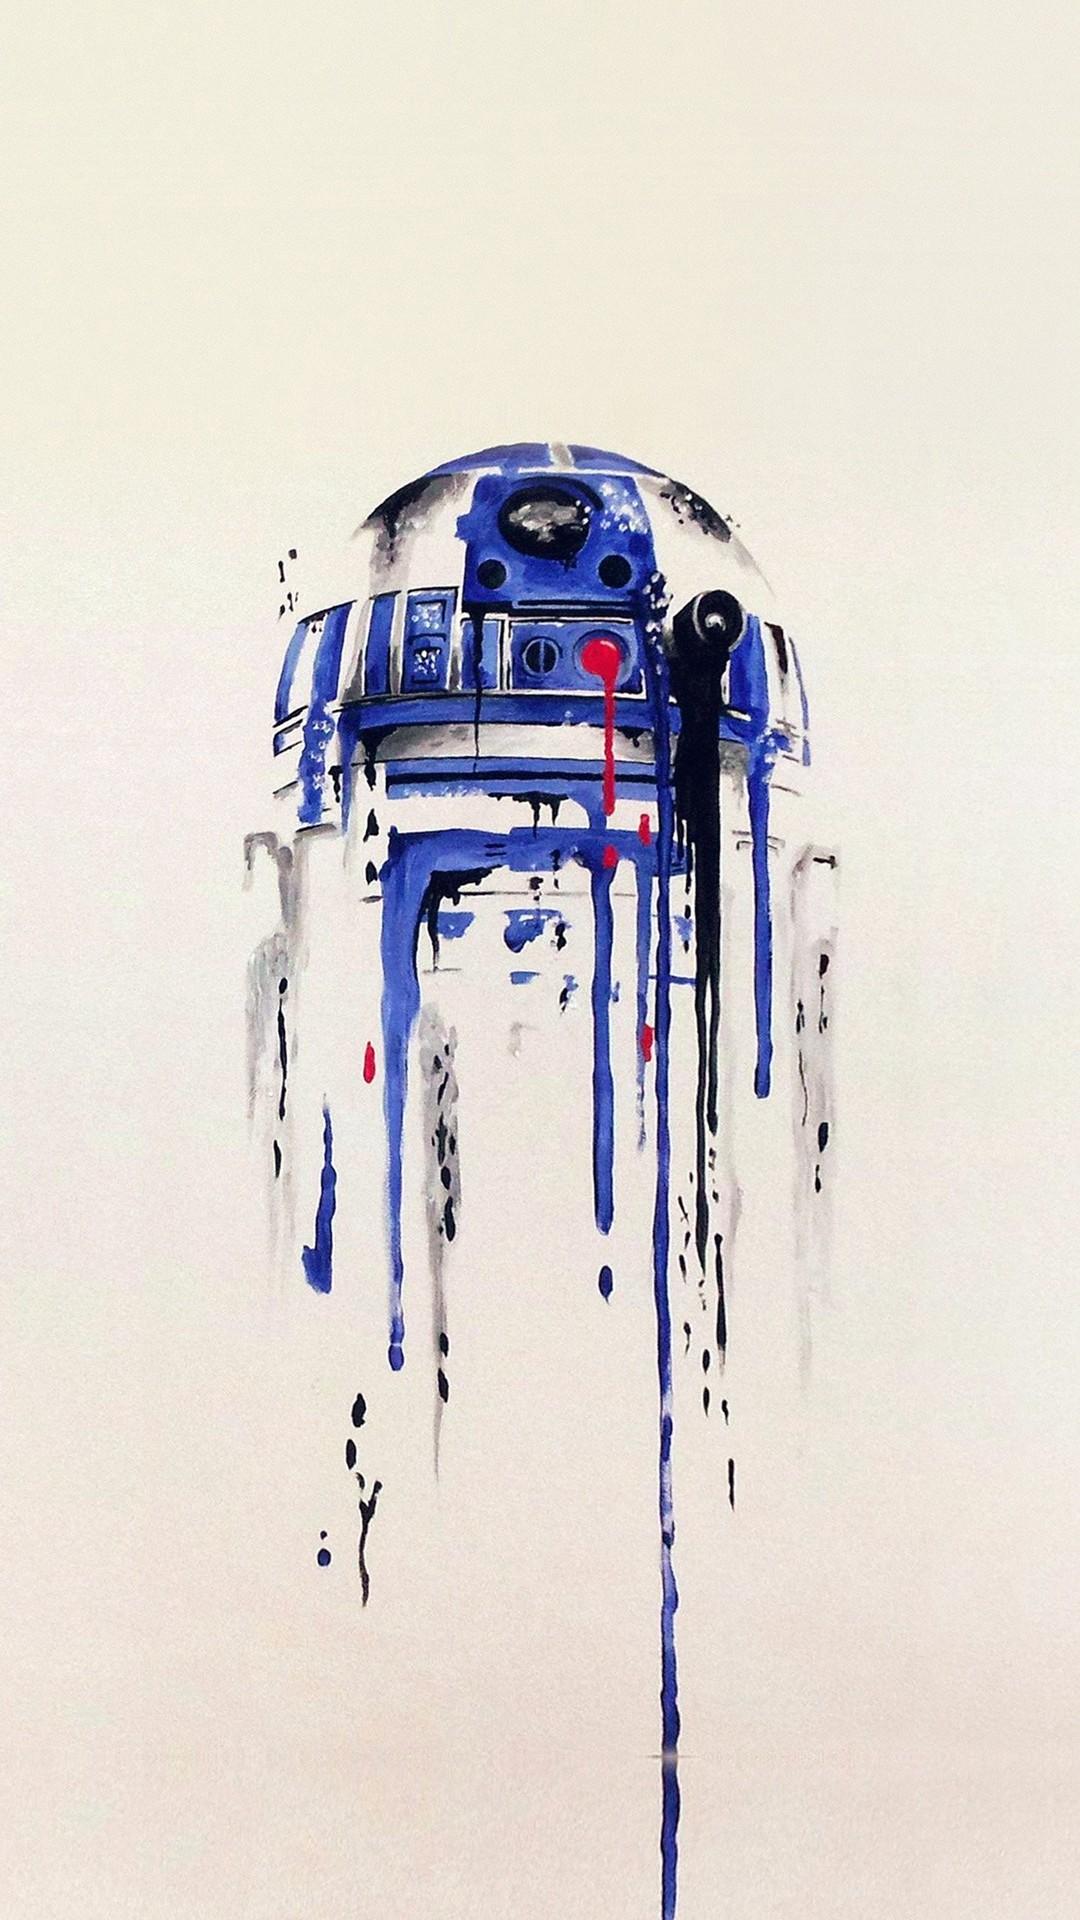 Minimal Painting Starwars Art Illustration. Great iPhone 6 plus wallpaper.